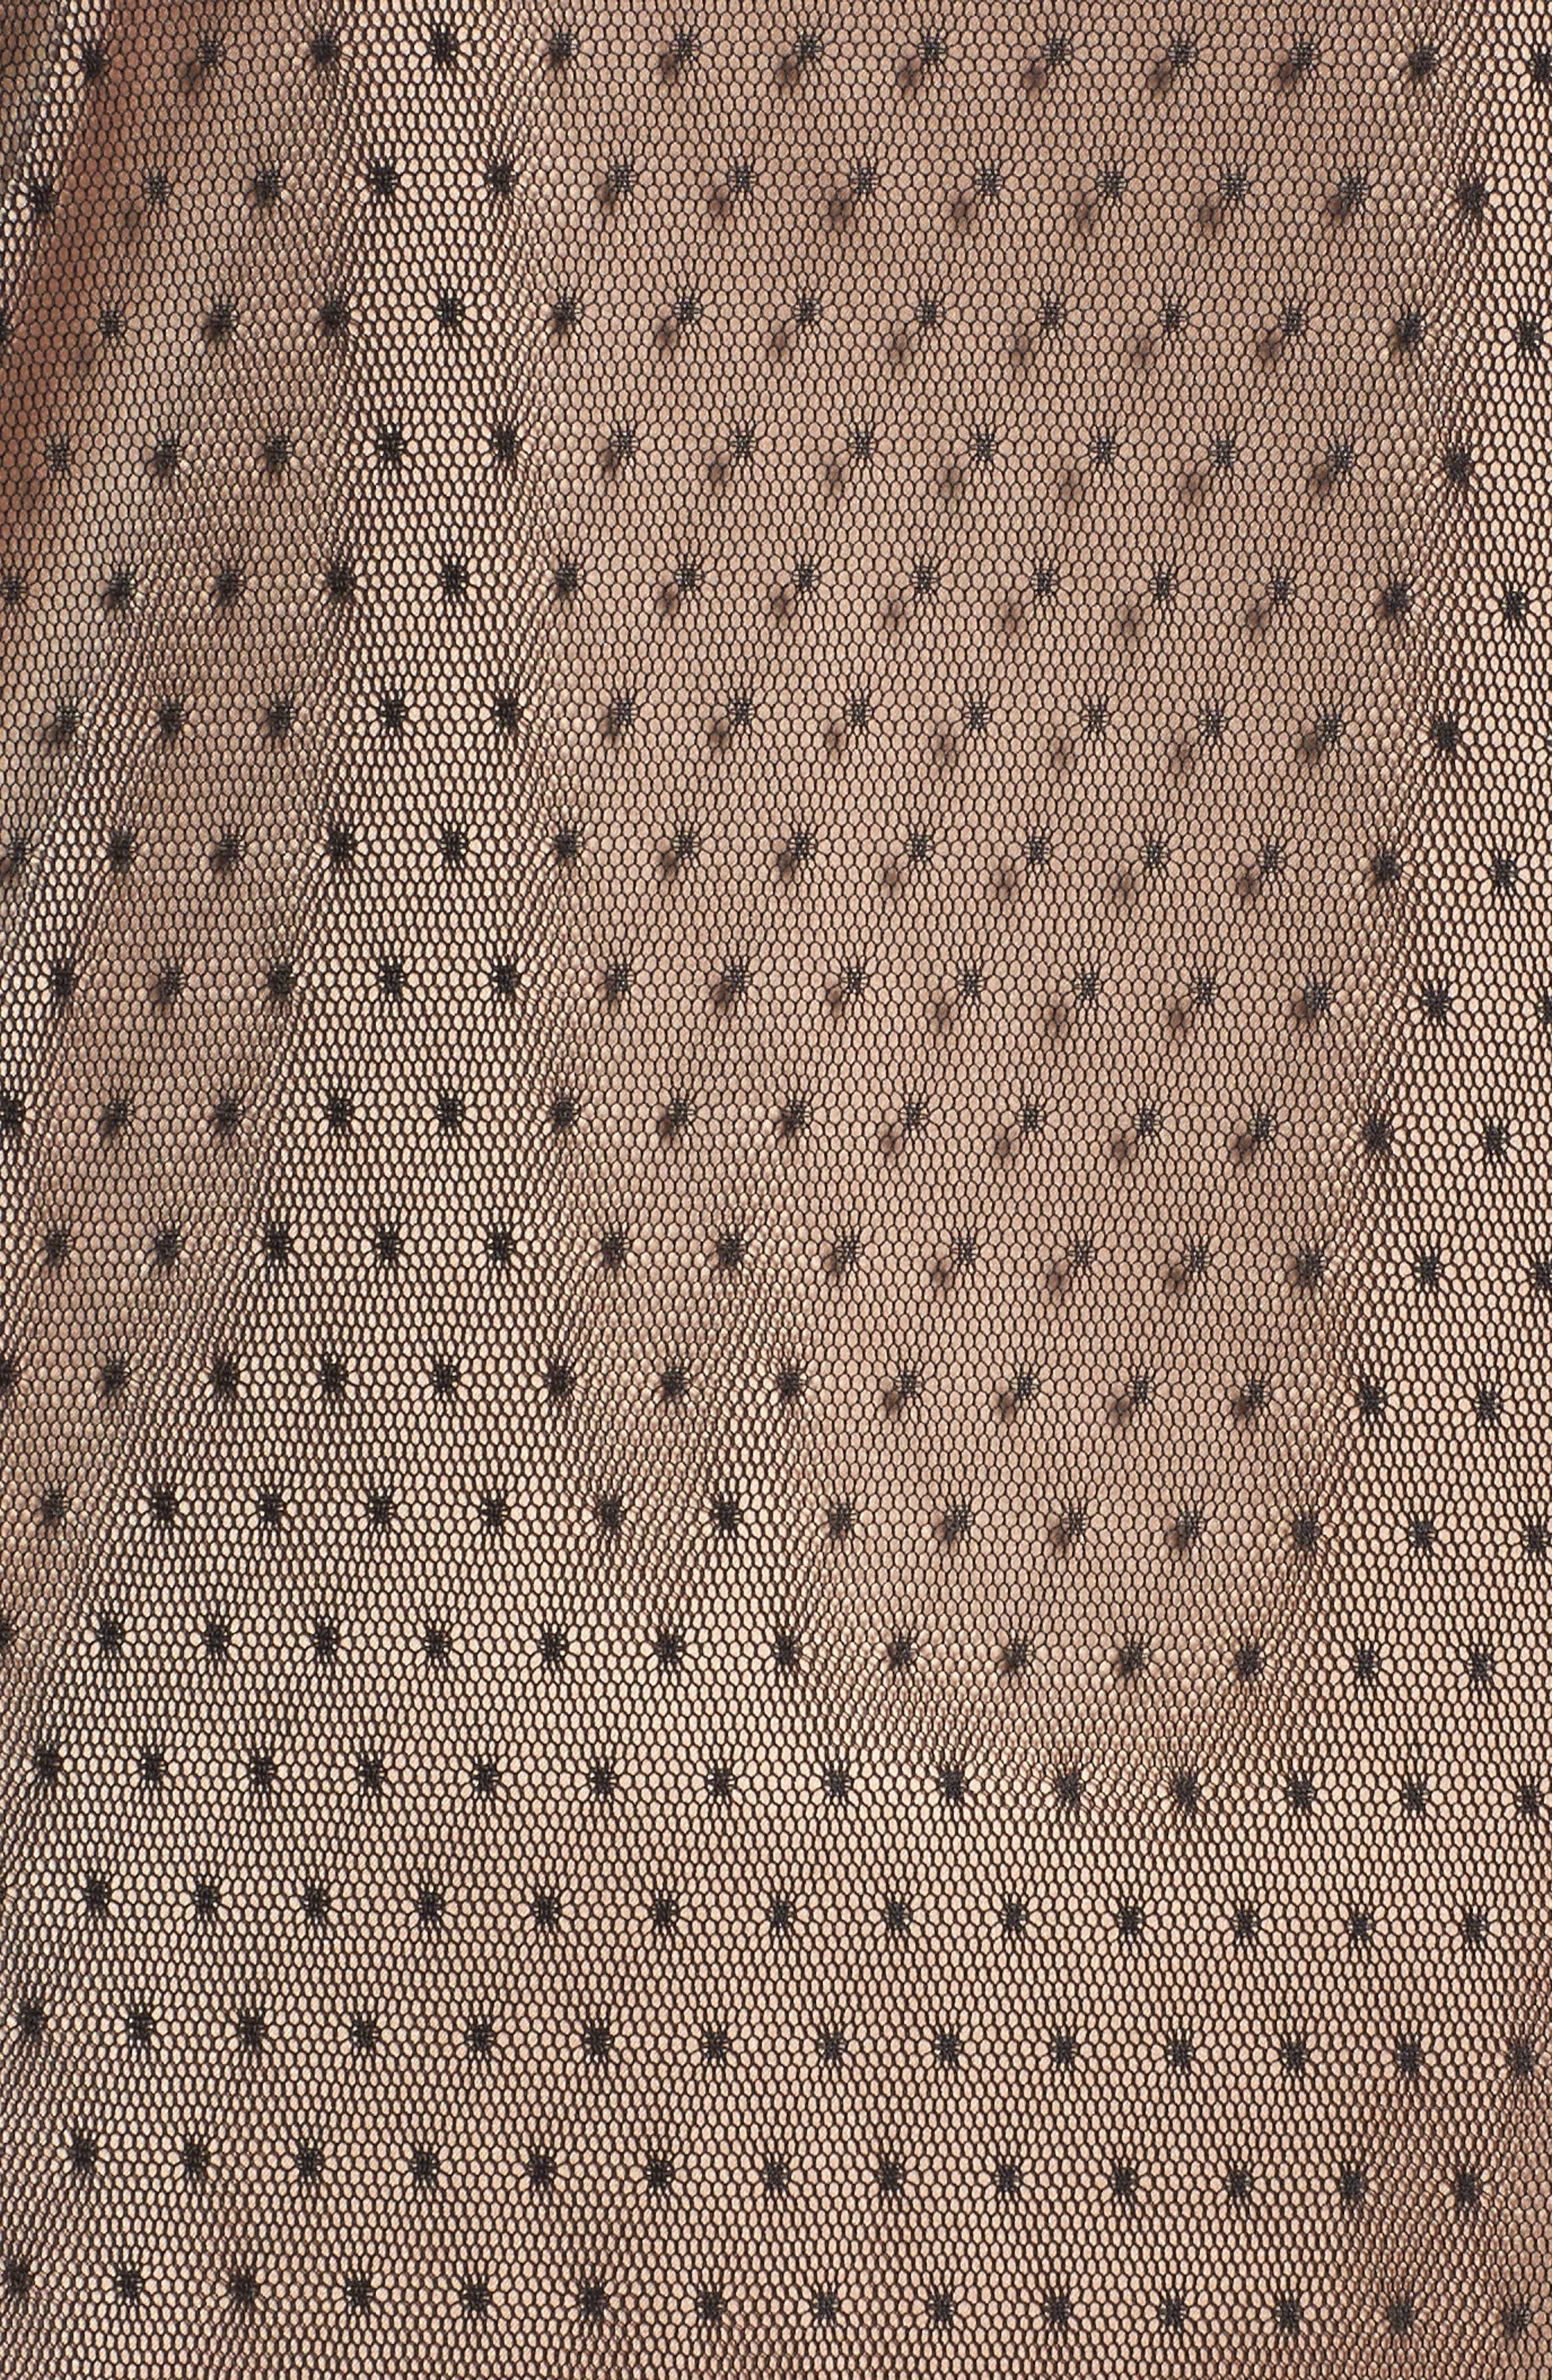 Polka Dot Net Shift Dress,                             Alternate thumbnail 5, color,                             Black